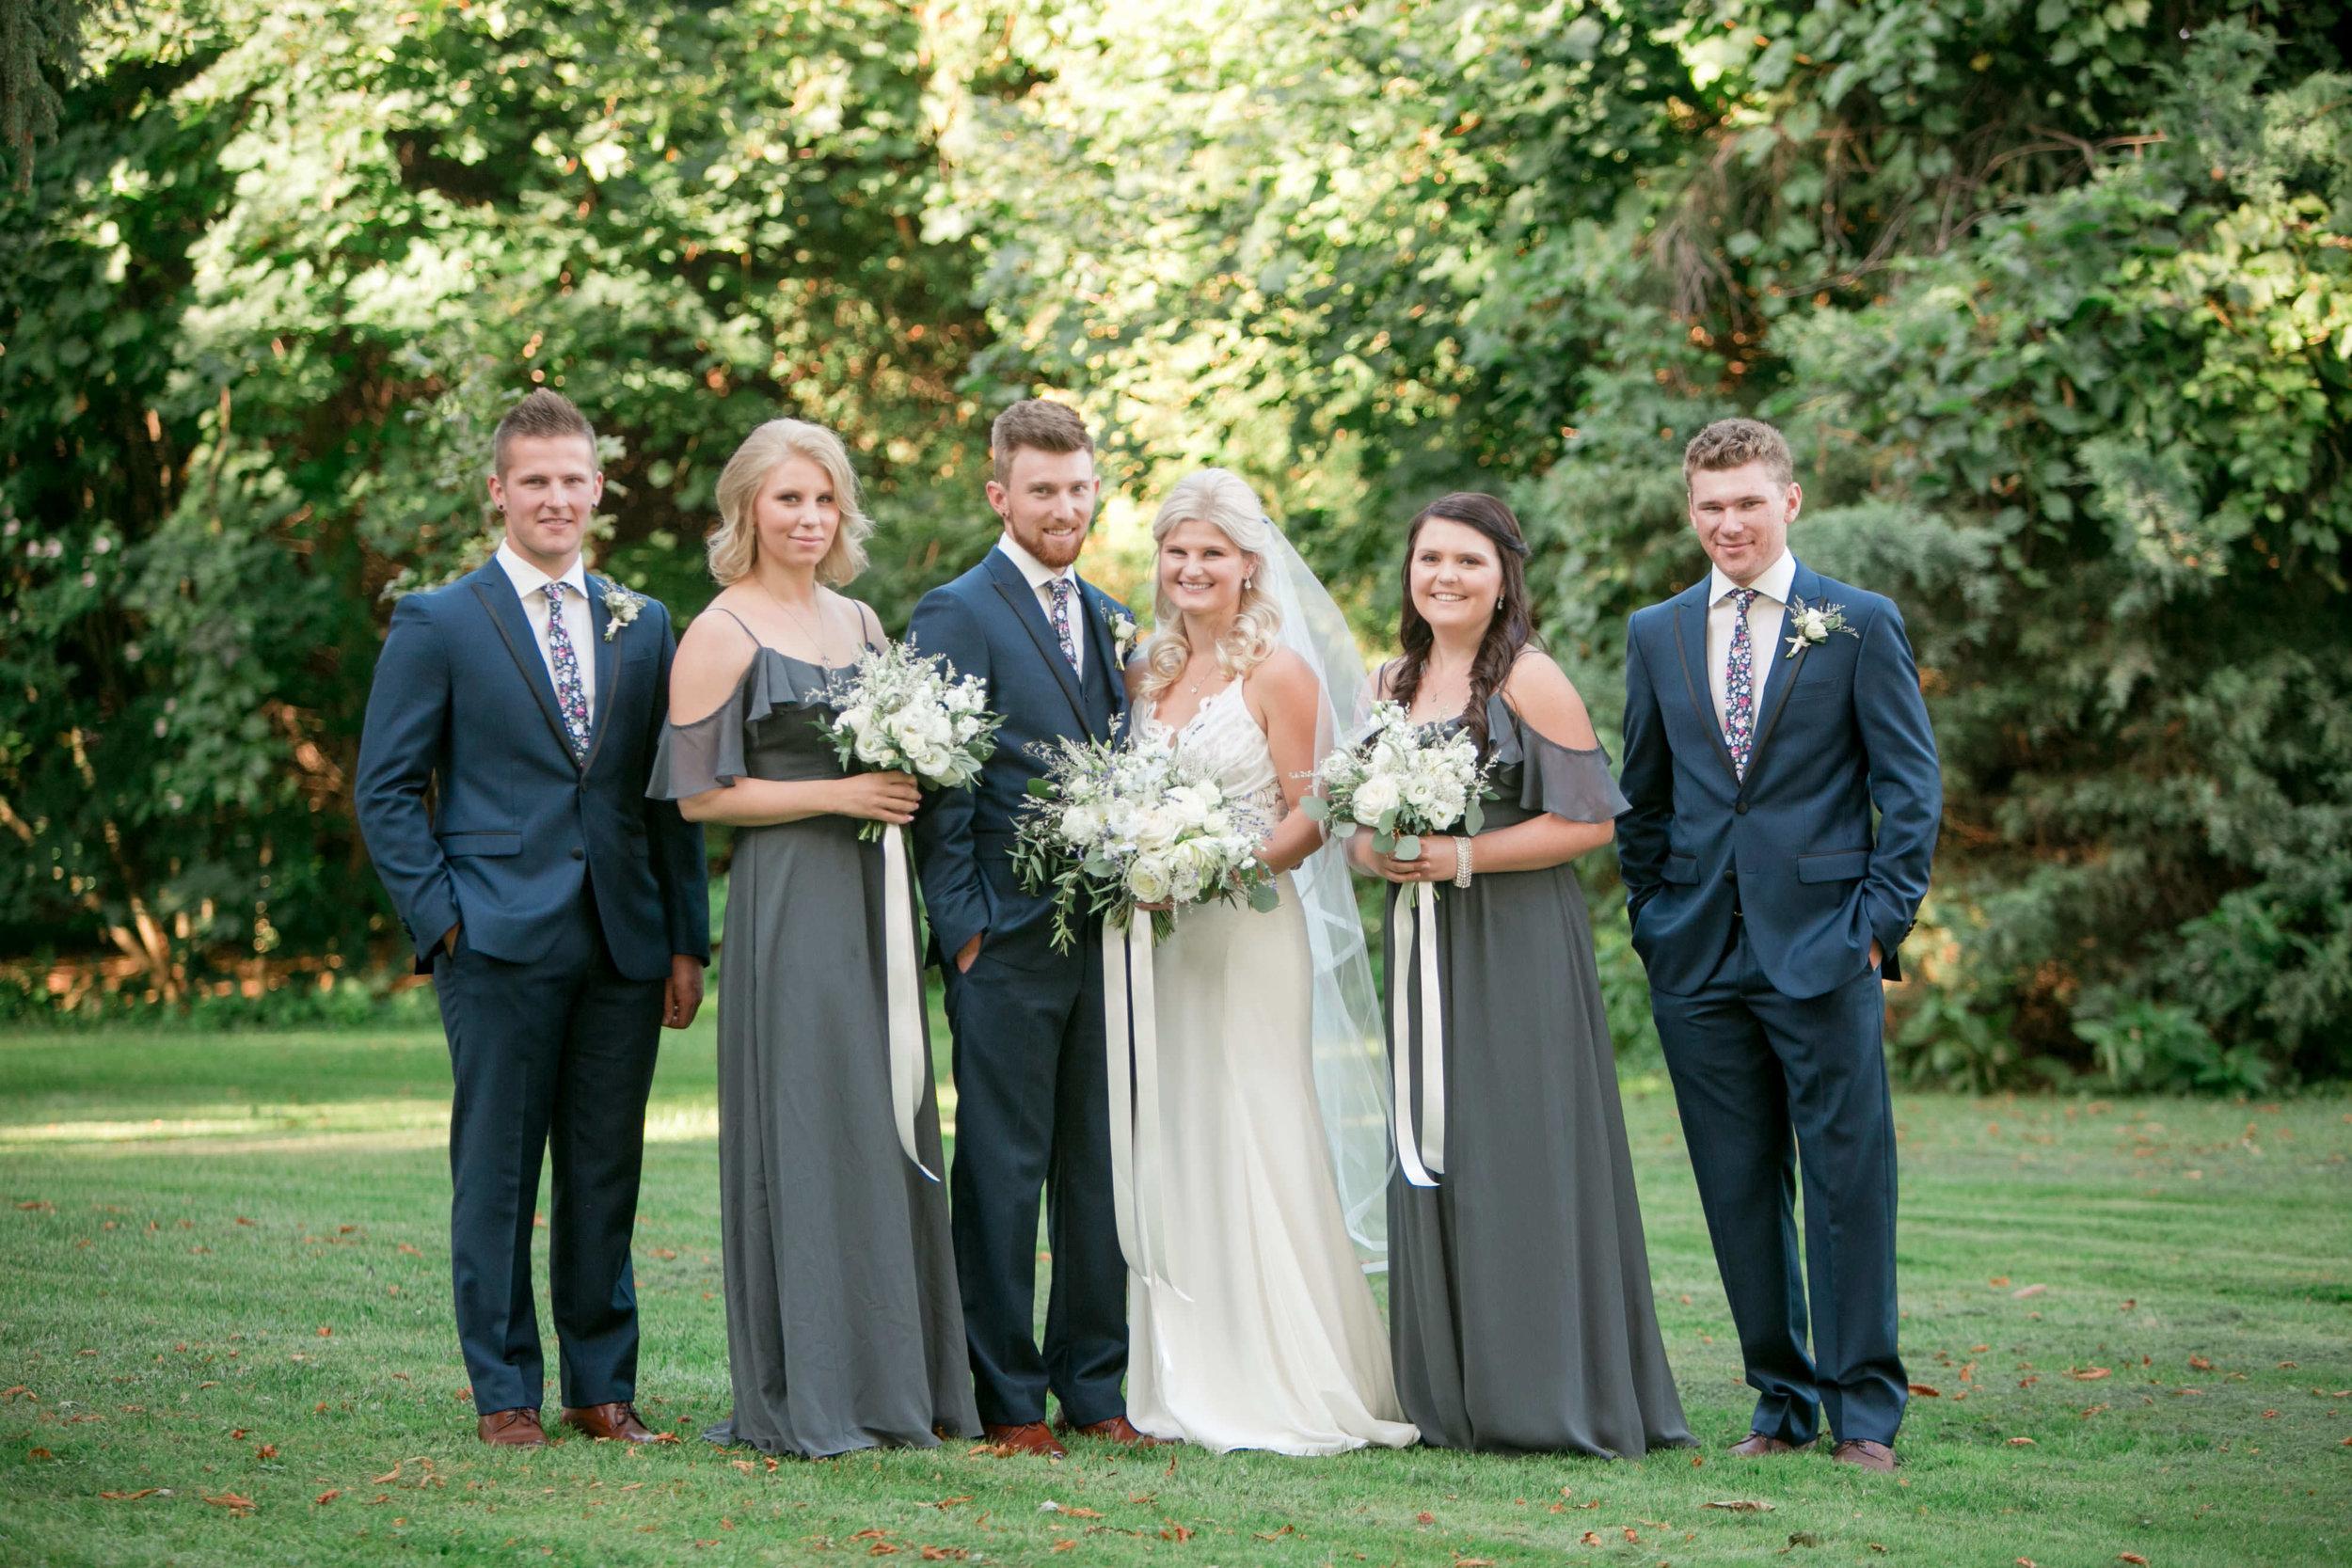 Maddy___Brandon___Daniel_Ricci_Weddings_High_Res._Finals_402.jpg